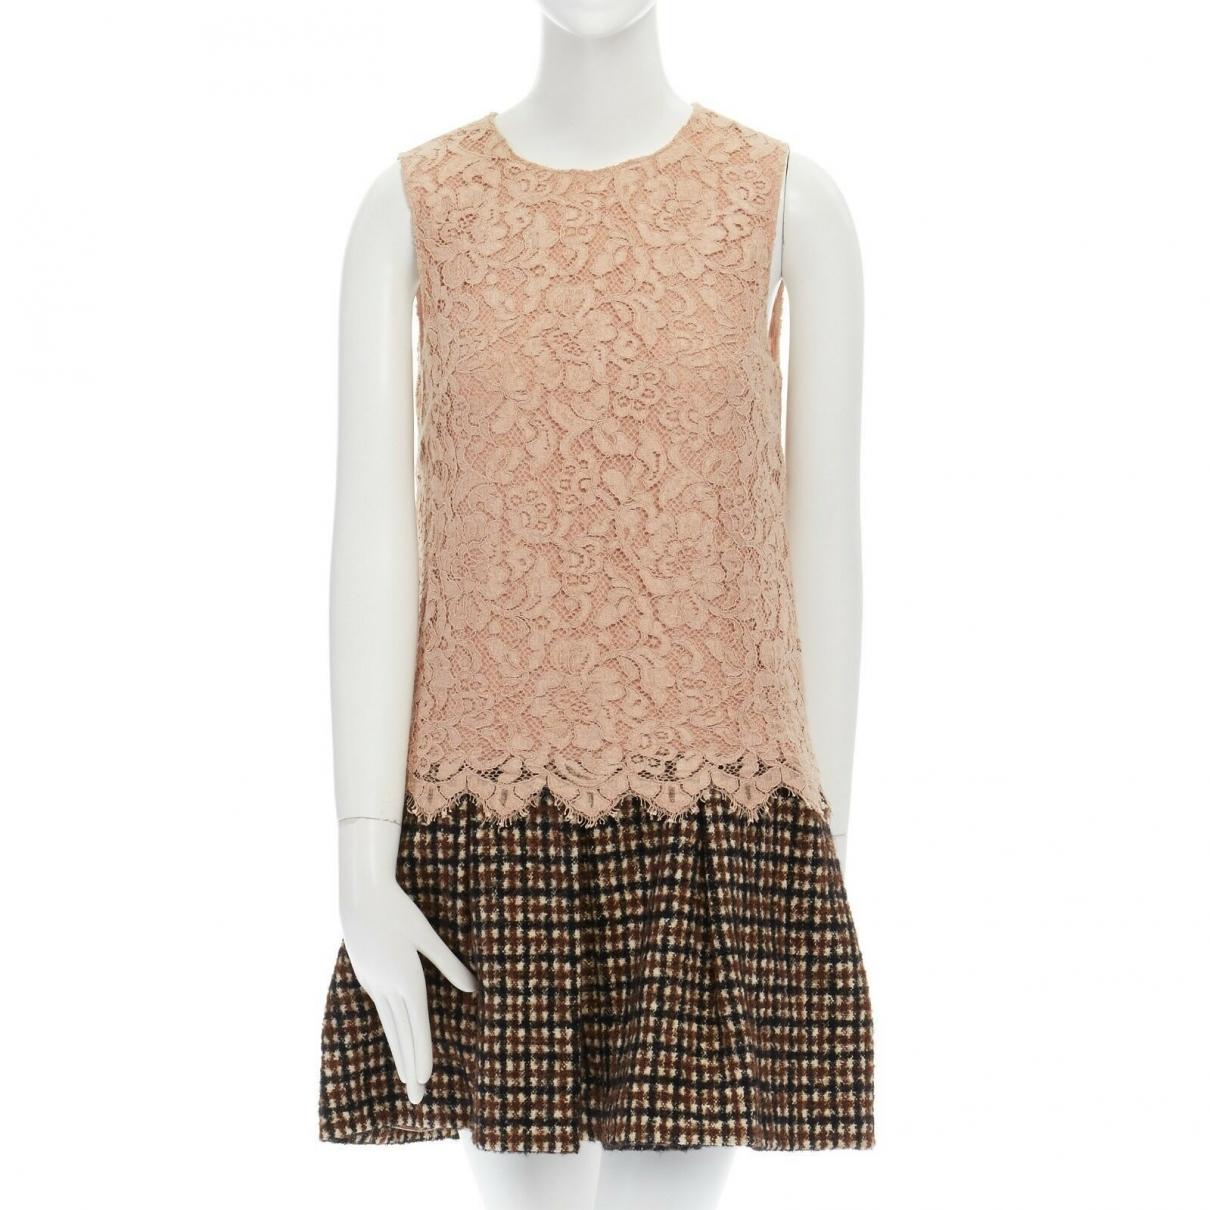 Dolce & Gabbana \N Multicolour Lace dress for Women S